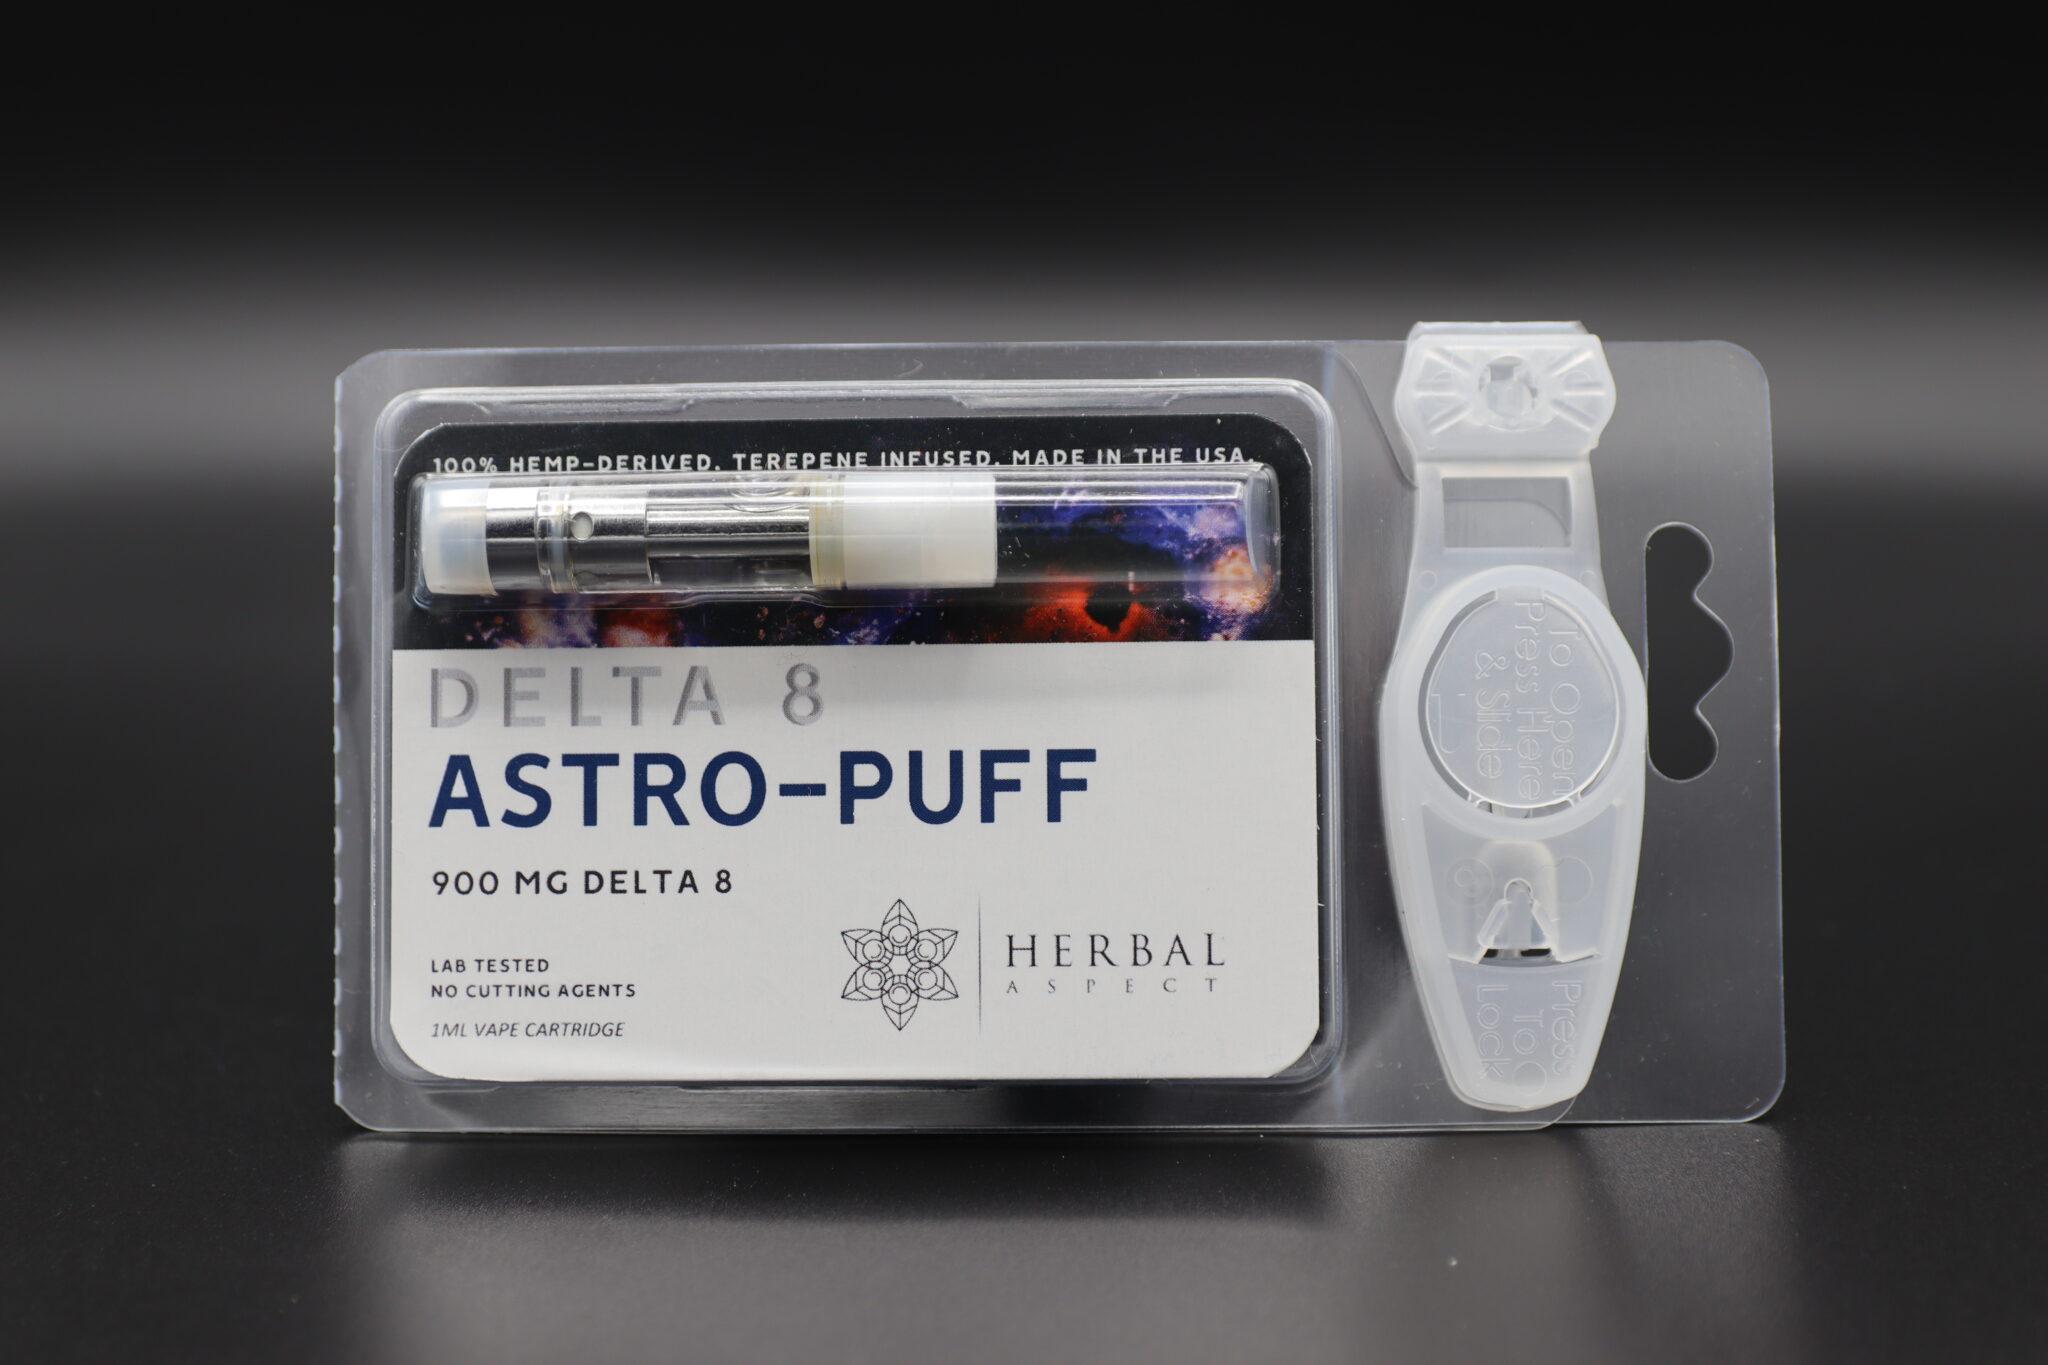 Herbal Aspect Delta 8 Vape - 900 MG - Astro Puff